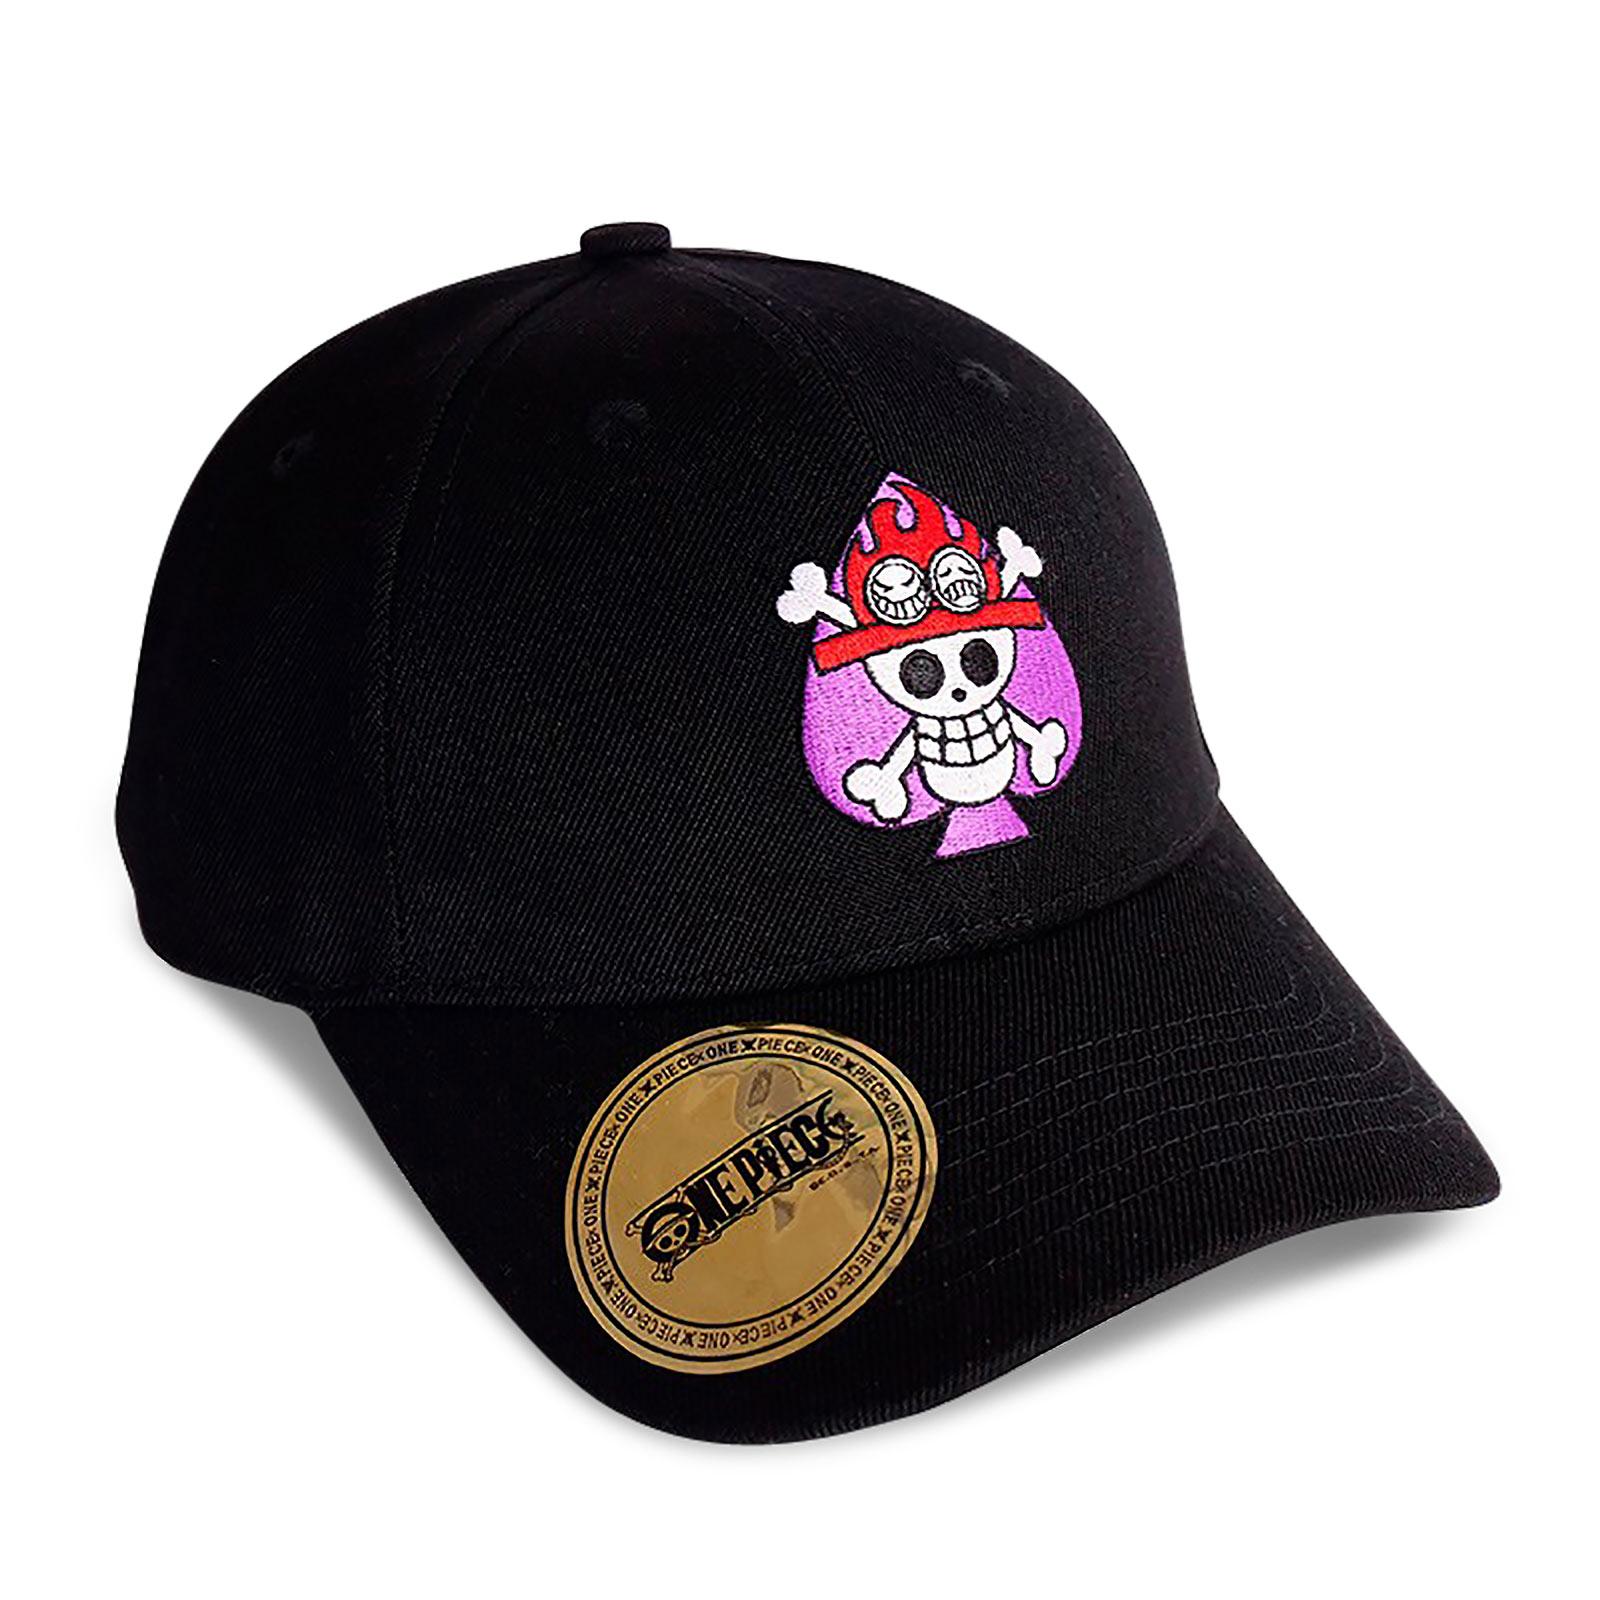 One Piece - Portgas D. Ace Skull Basecap